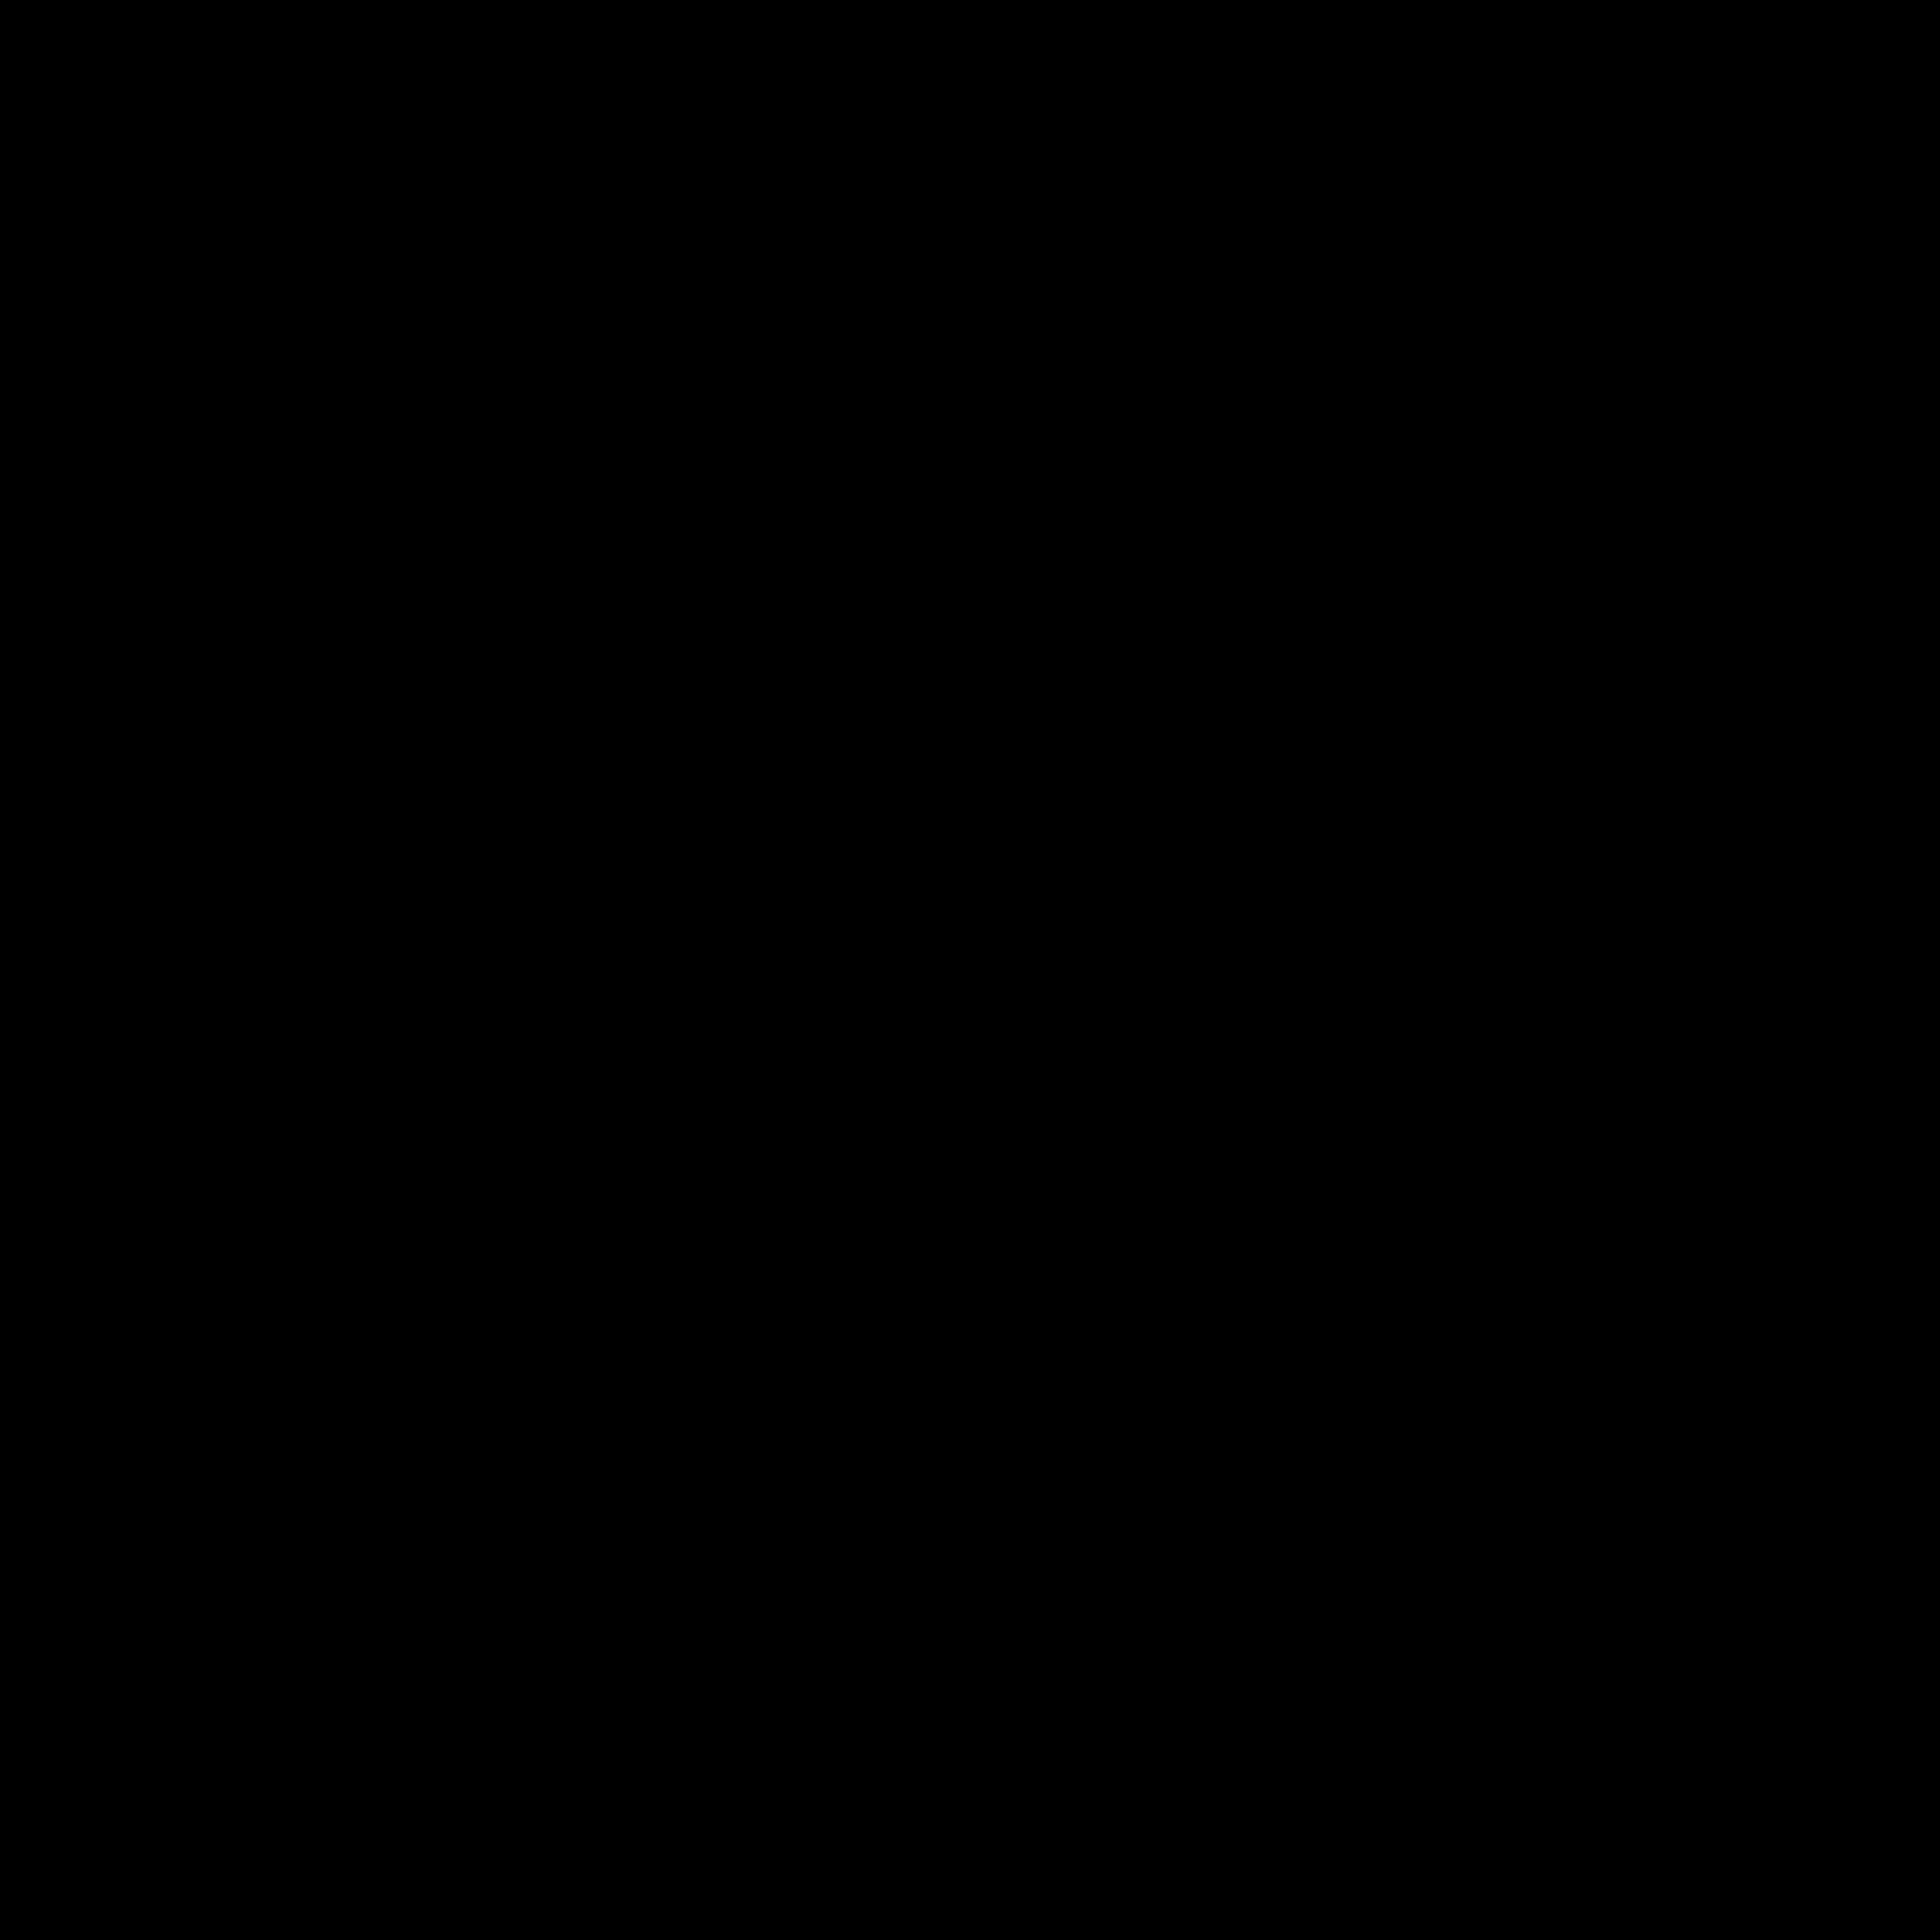 CBS logo black